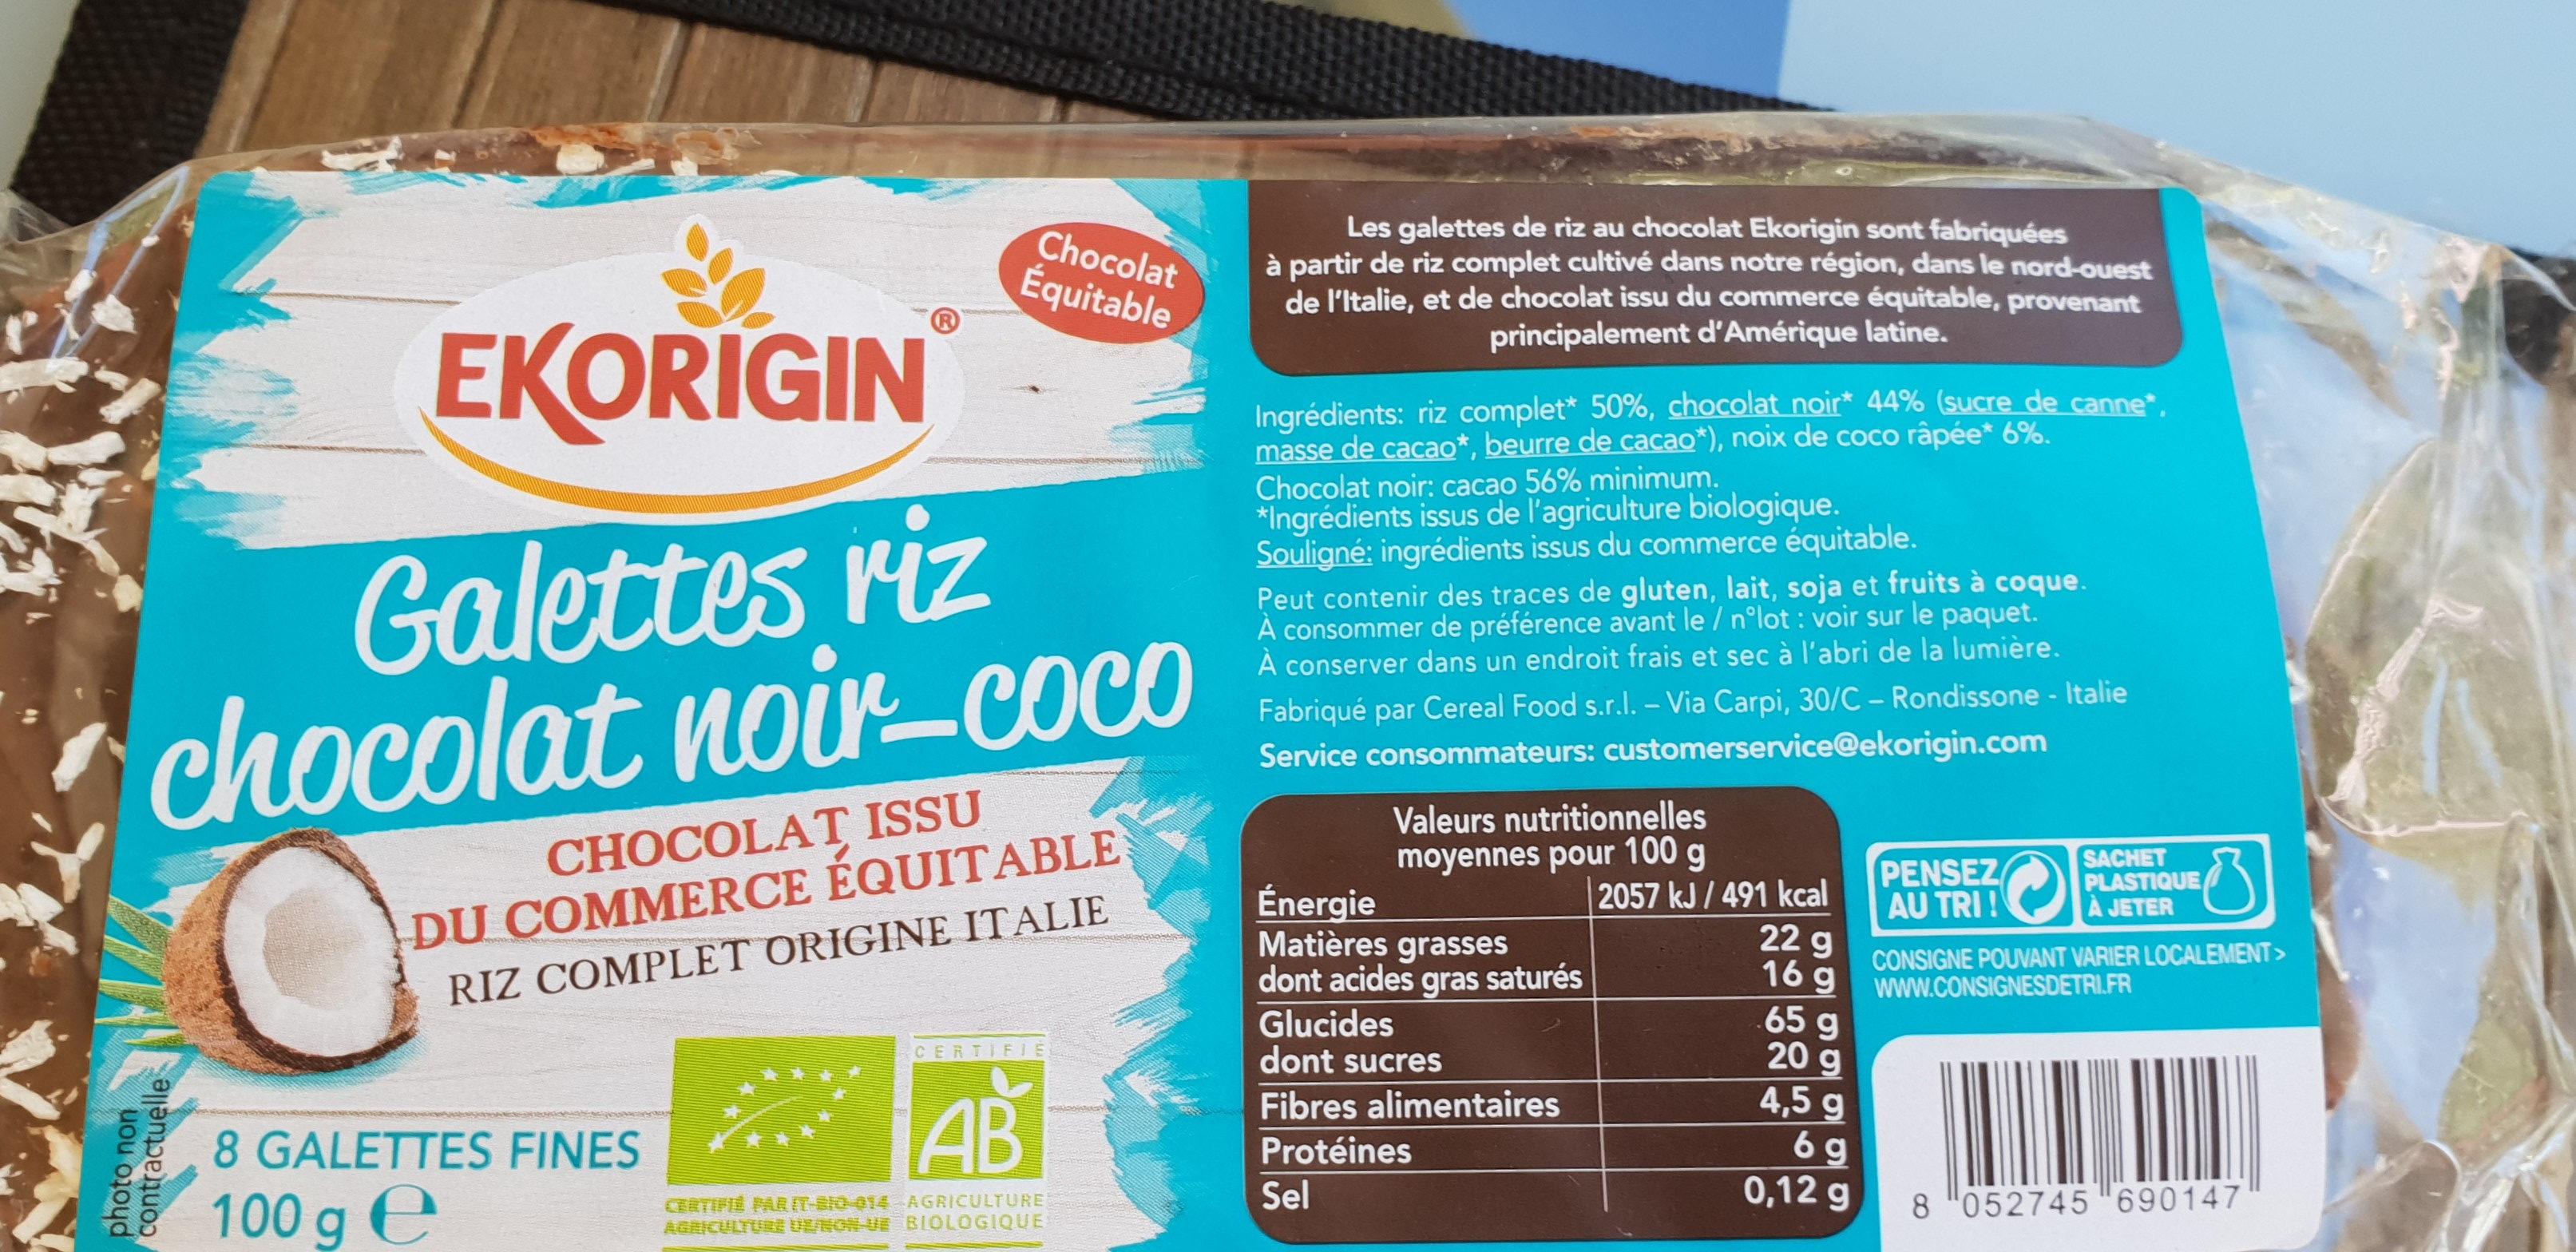 Galette de riz chocolat noir coco - 产品 - fr